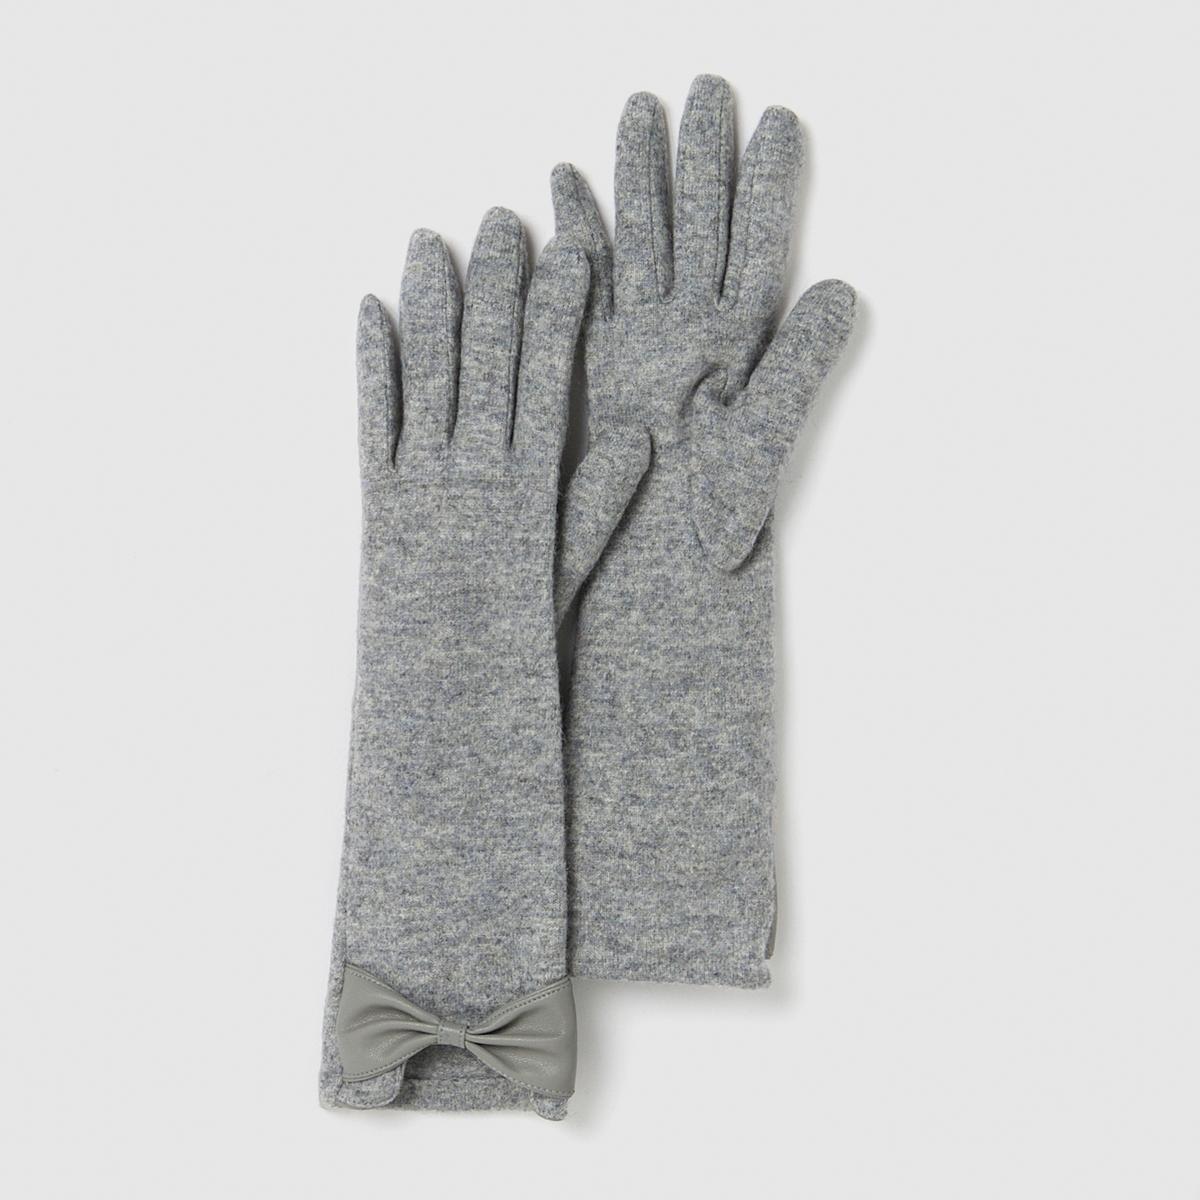 Перчатки - Atelier RПерчатки Atelier RМатериал: 80% полиэстера, 20% шерсти<br><br>Цвет: серый<br>Размер: единый размер